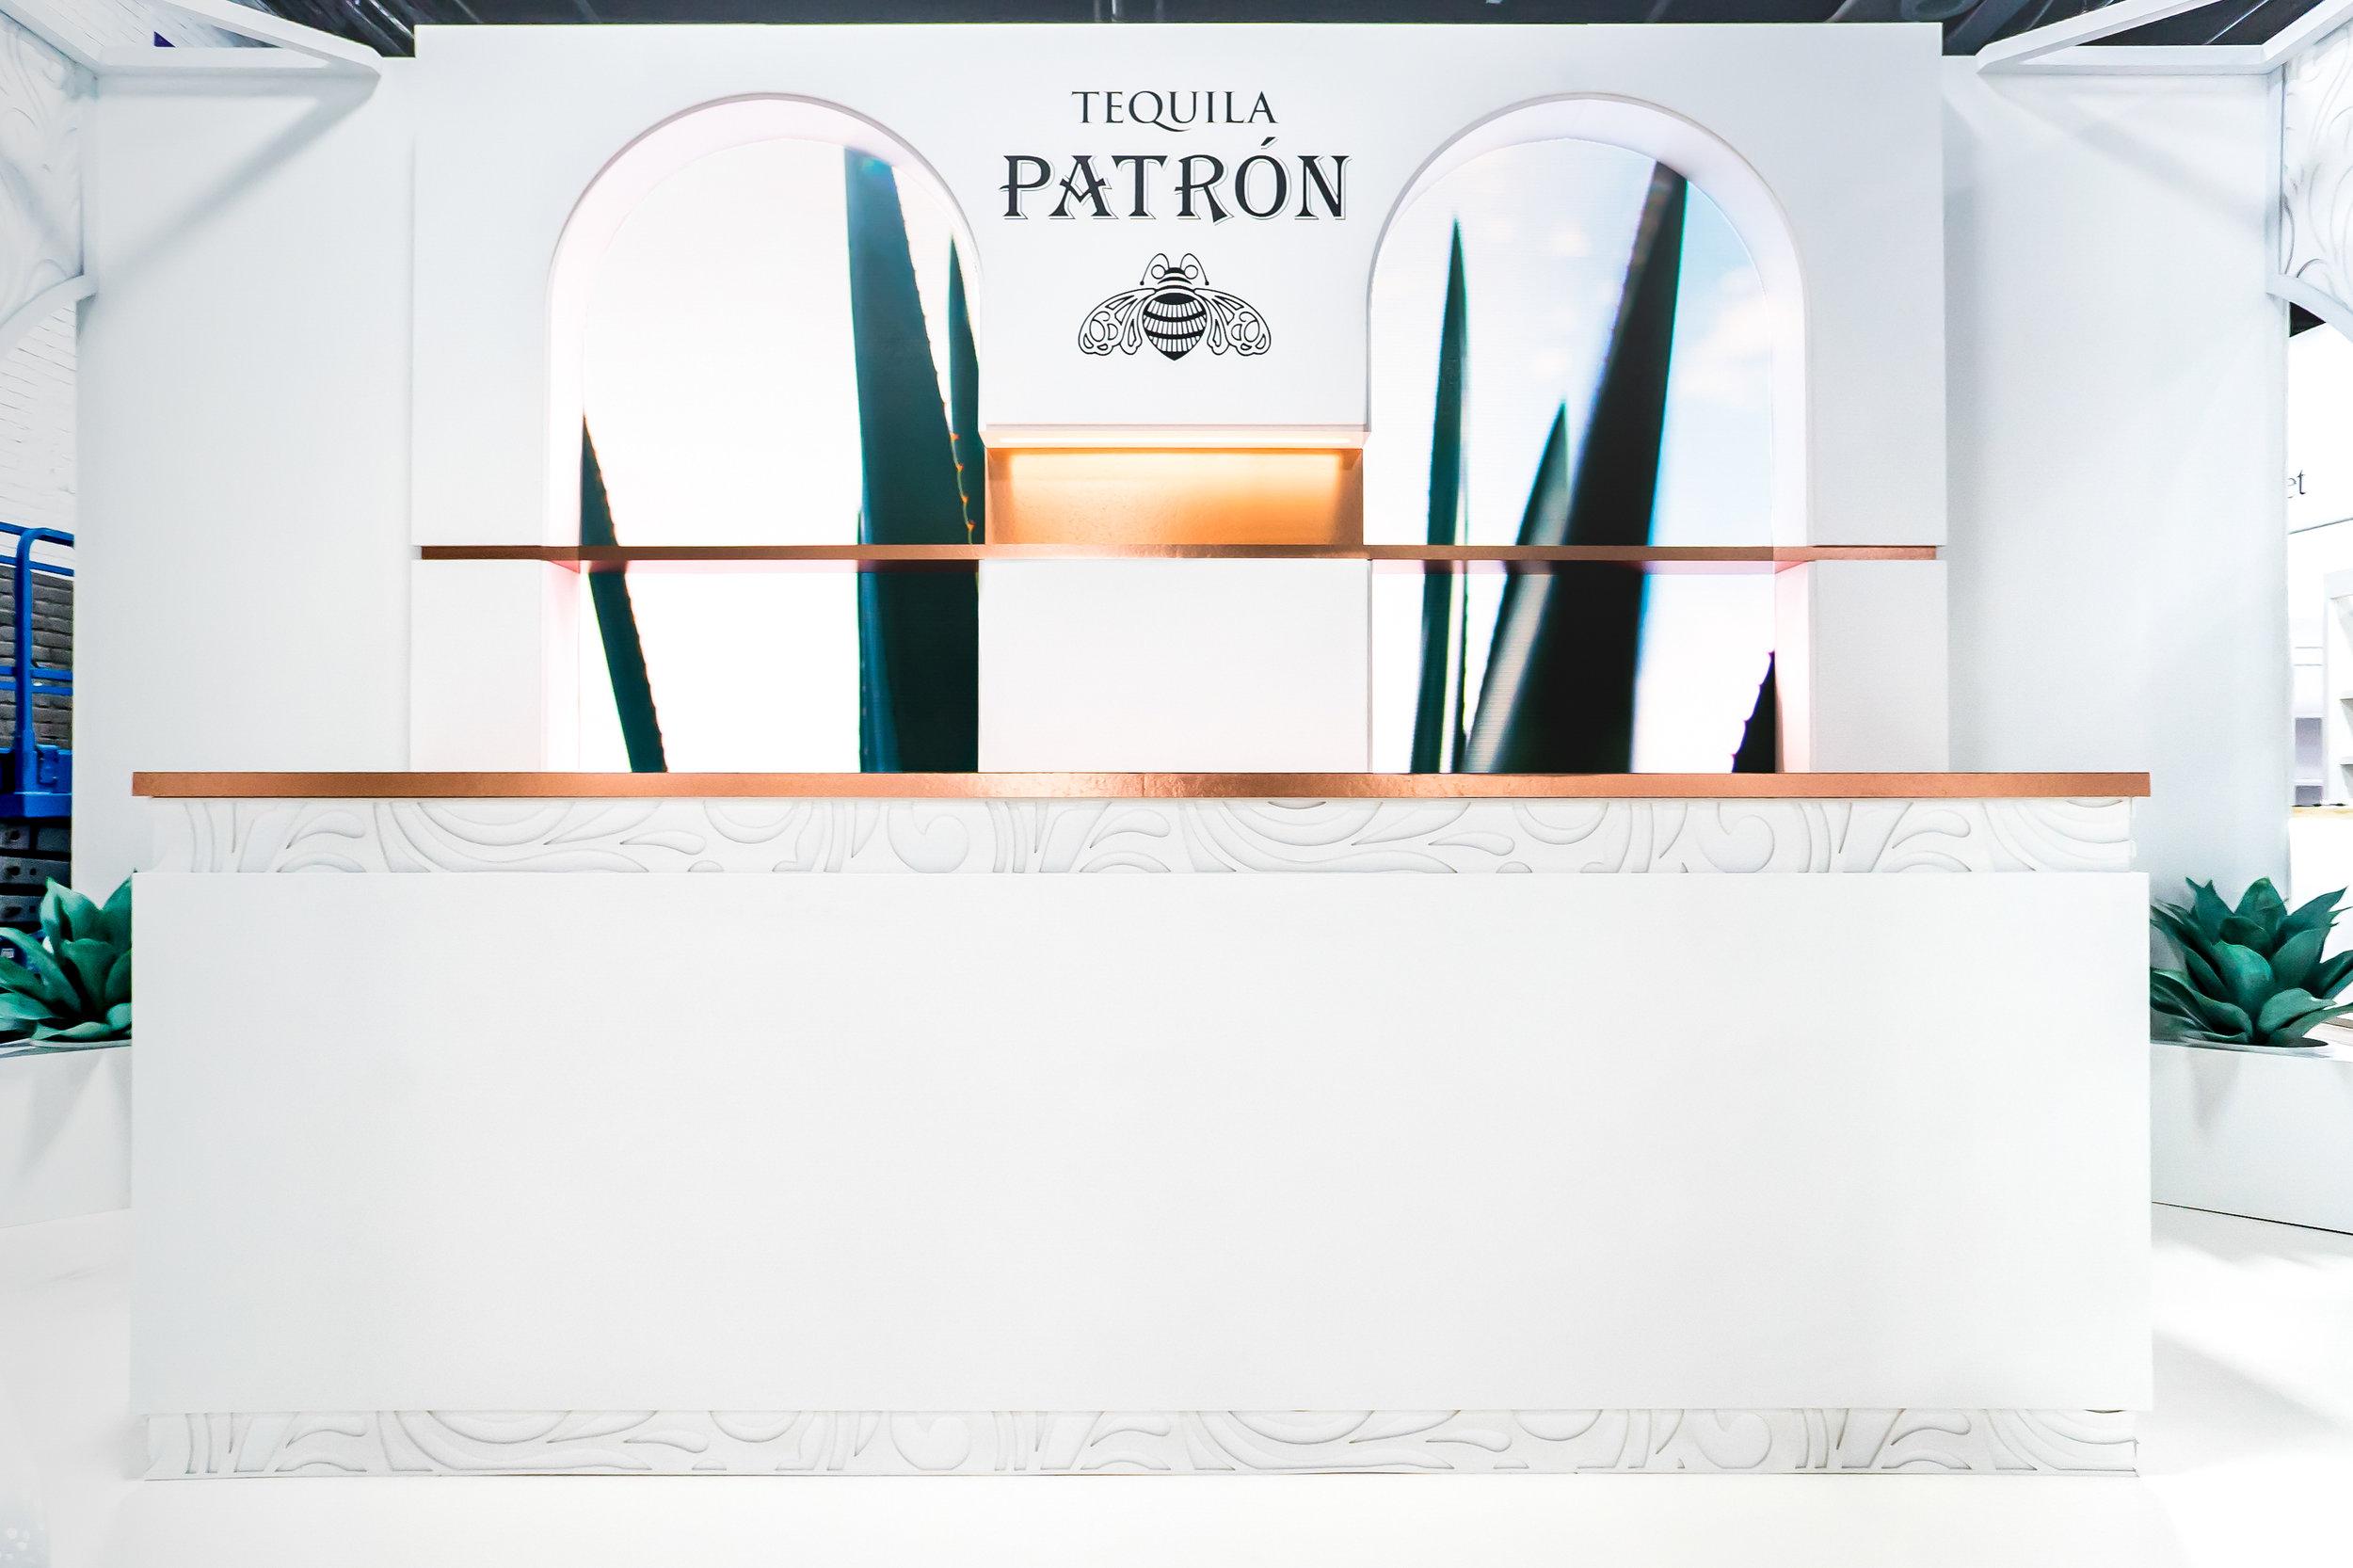 PATRON HACIENDA_WEBSITE UPDATE-5.JPG